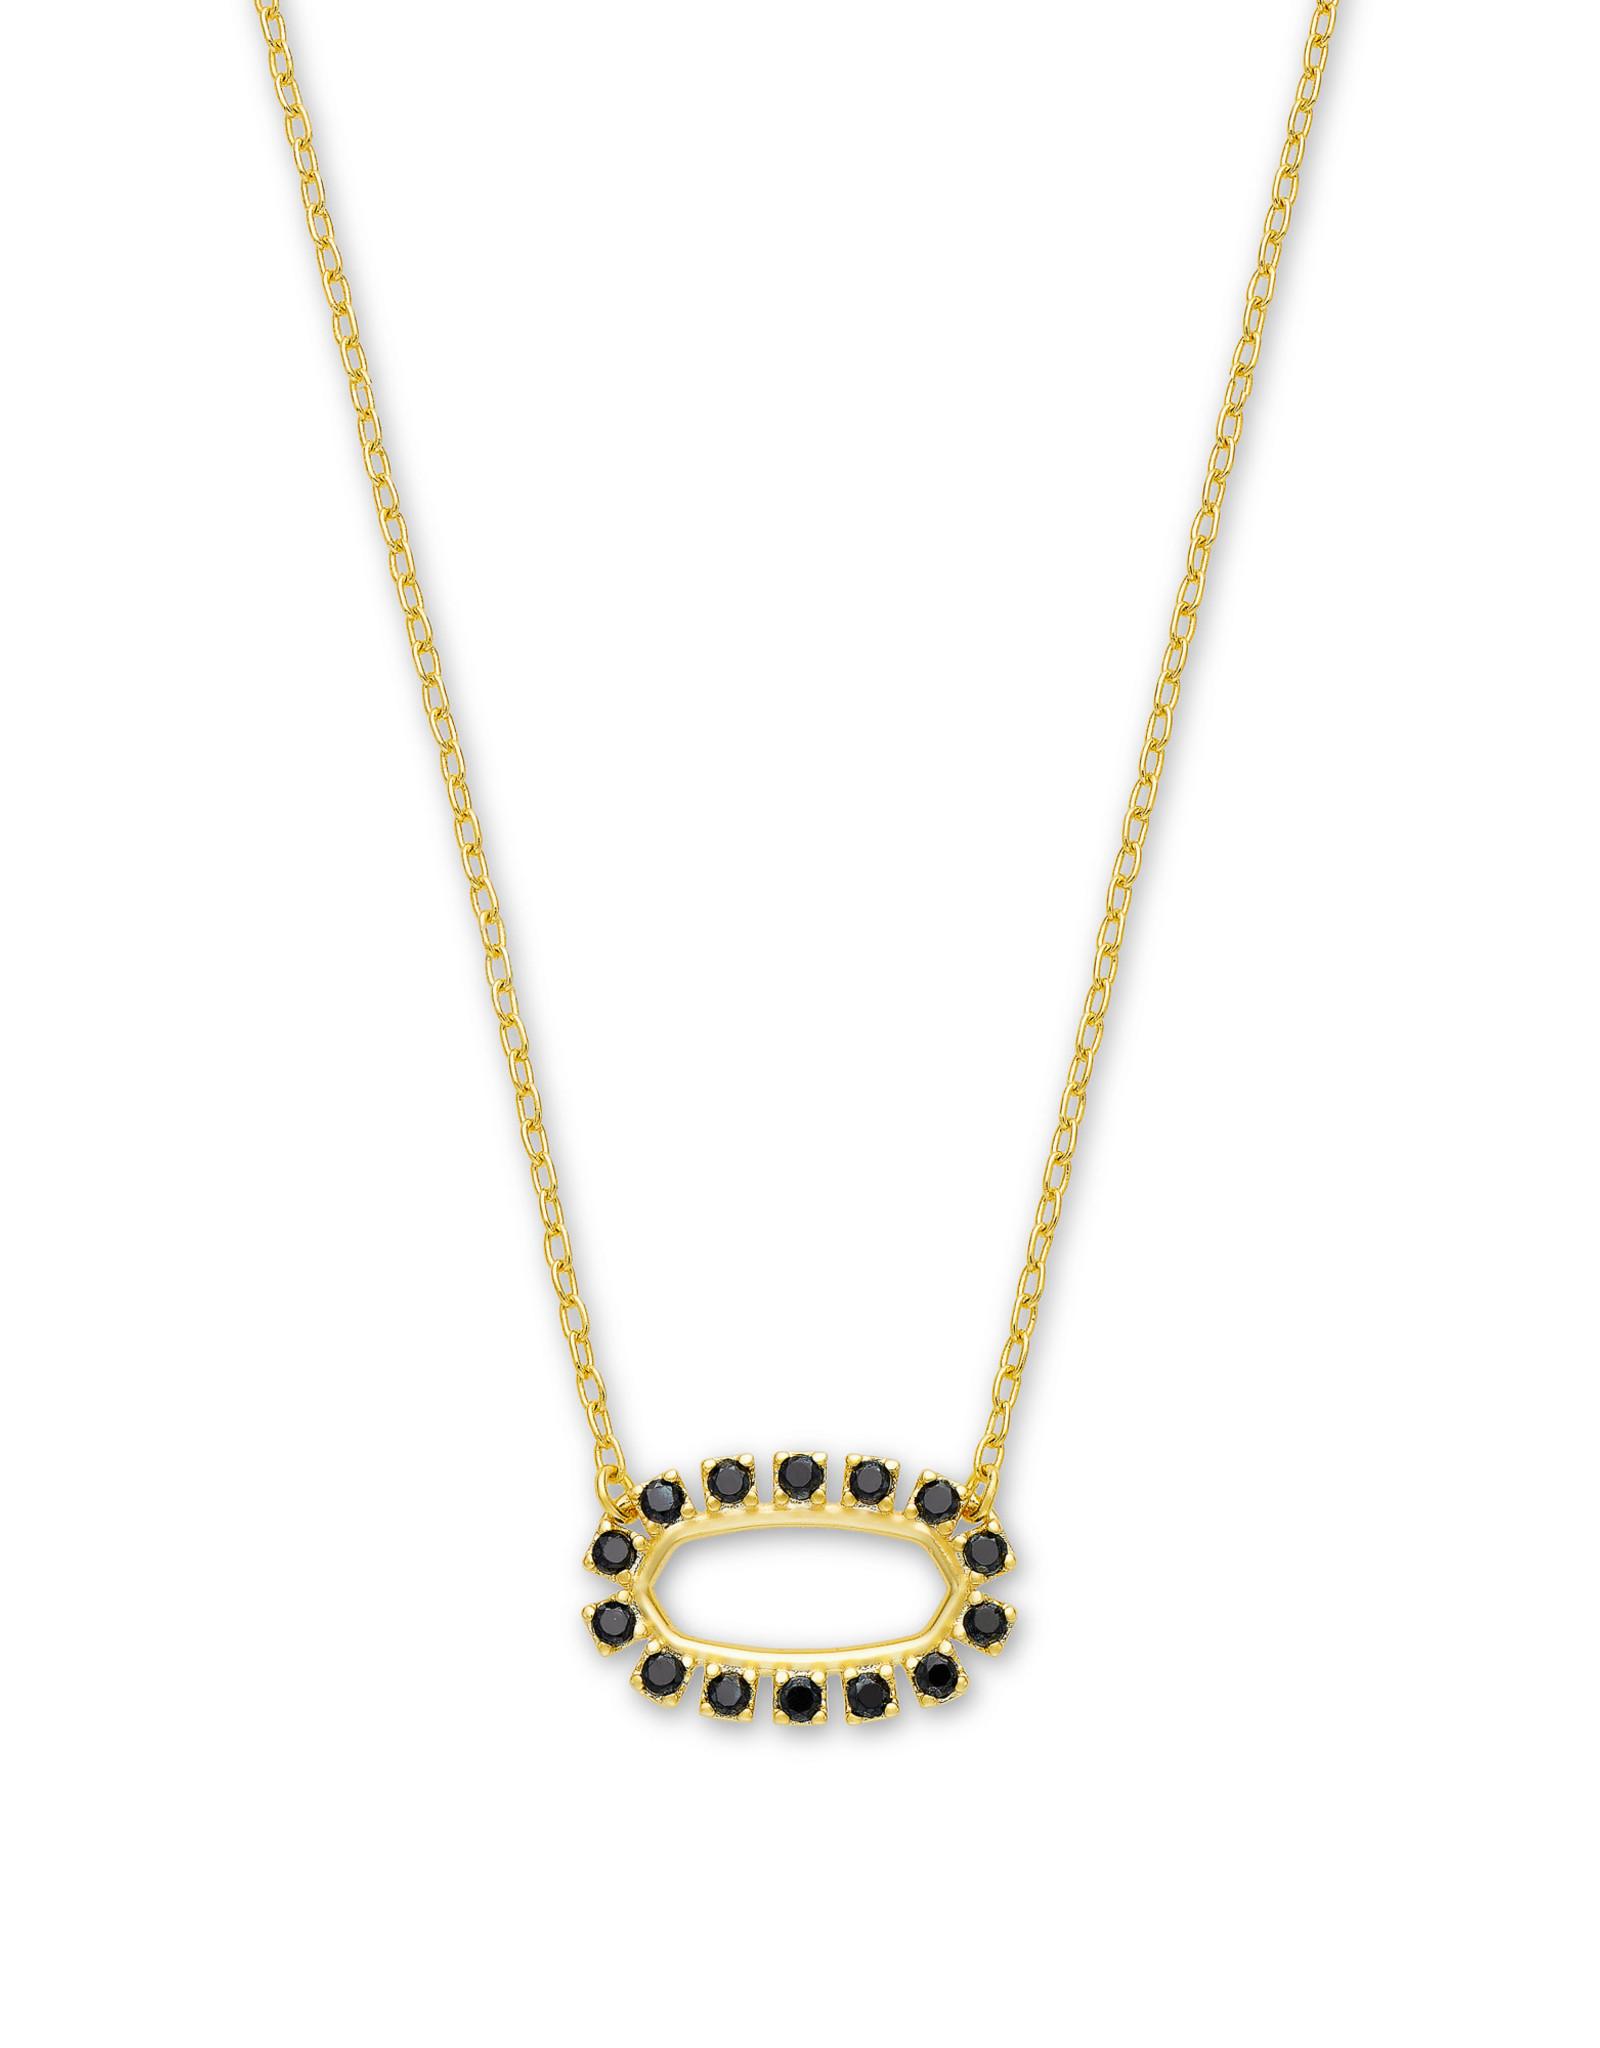 Kendra Scott Kendra Scott Elisa Open Frame Necklace